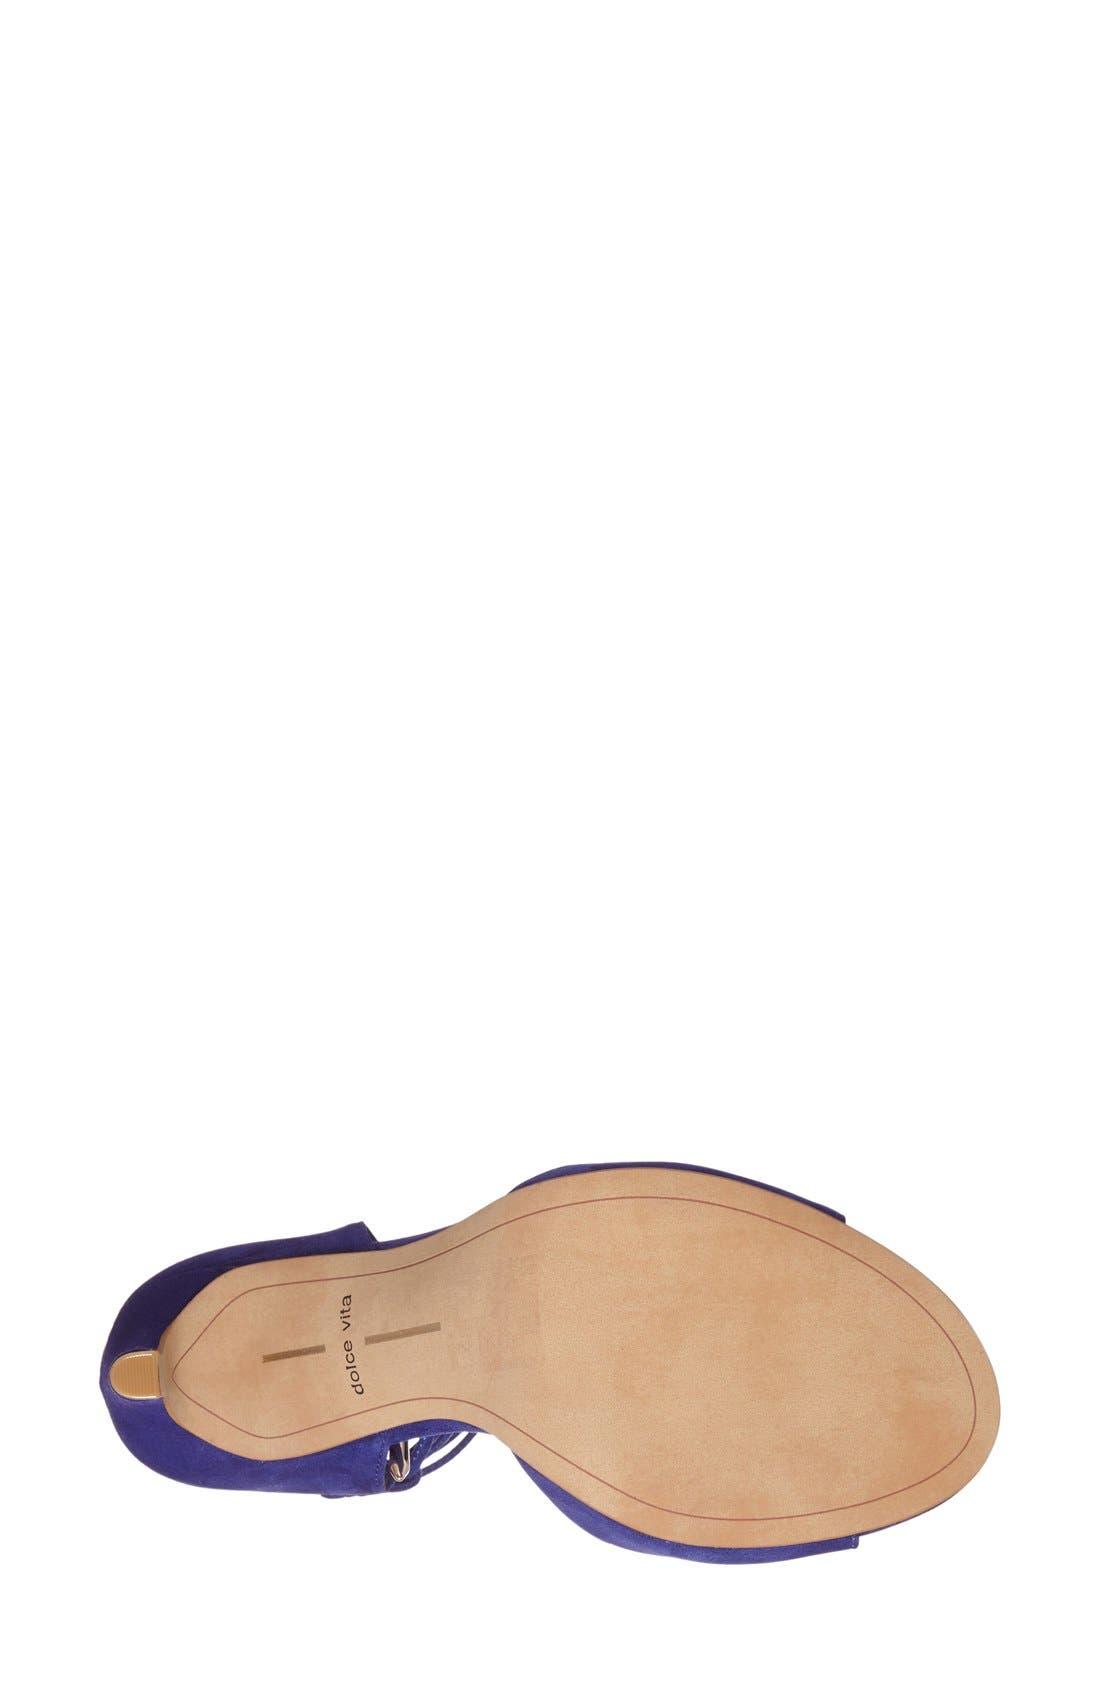 'Hazely' Lace-Up Sandal,                             Alternate thumbnail 4, color,                             Blue Suede